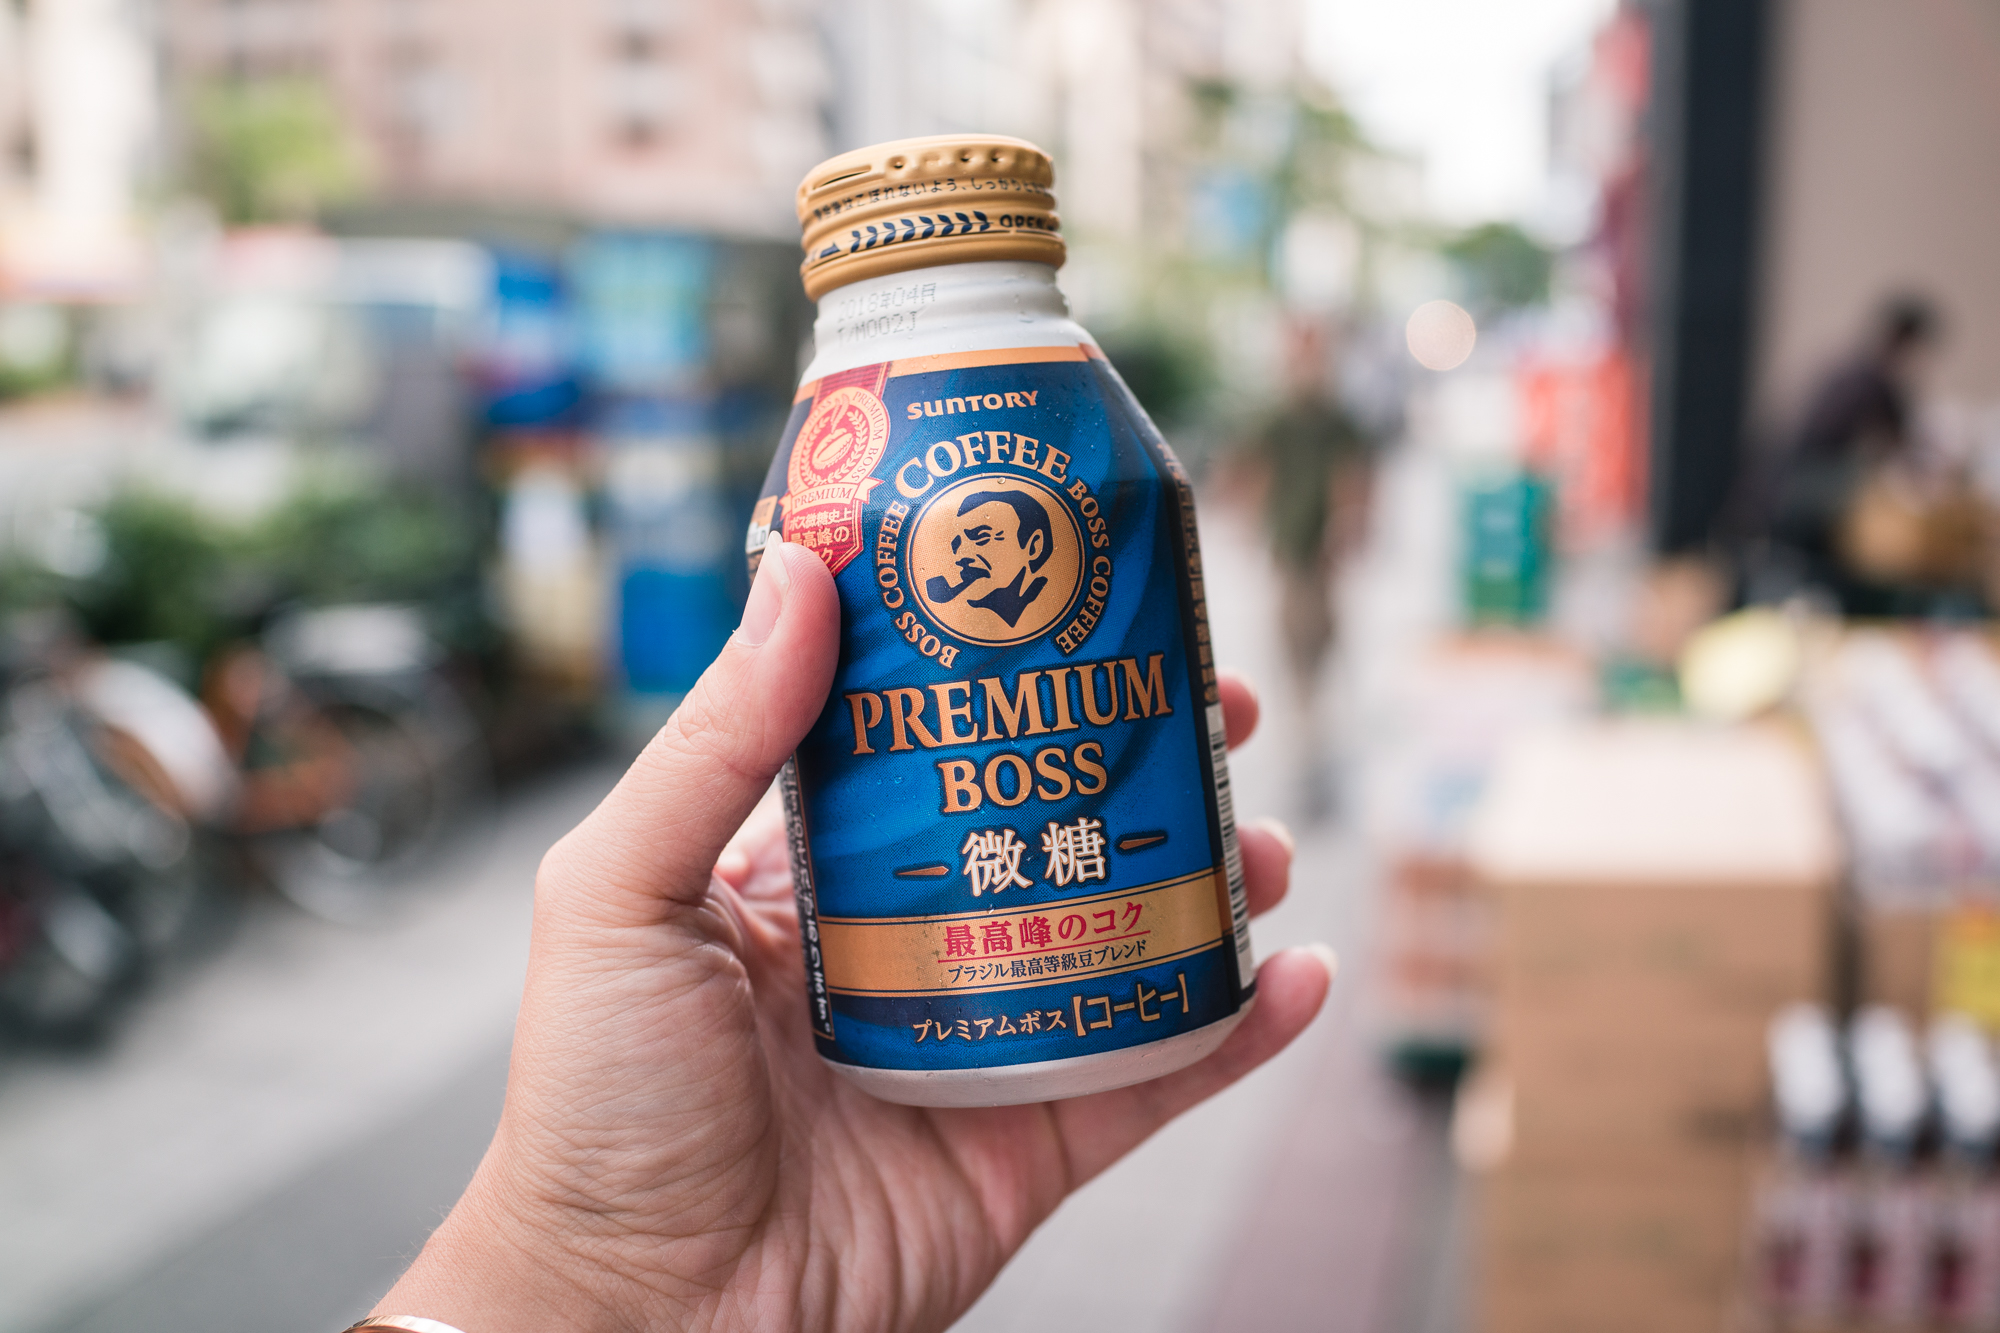 Premium Boss Coffee